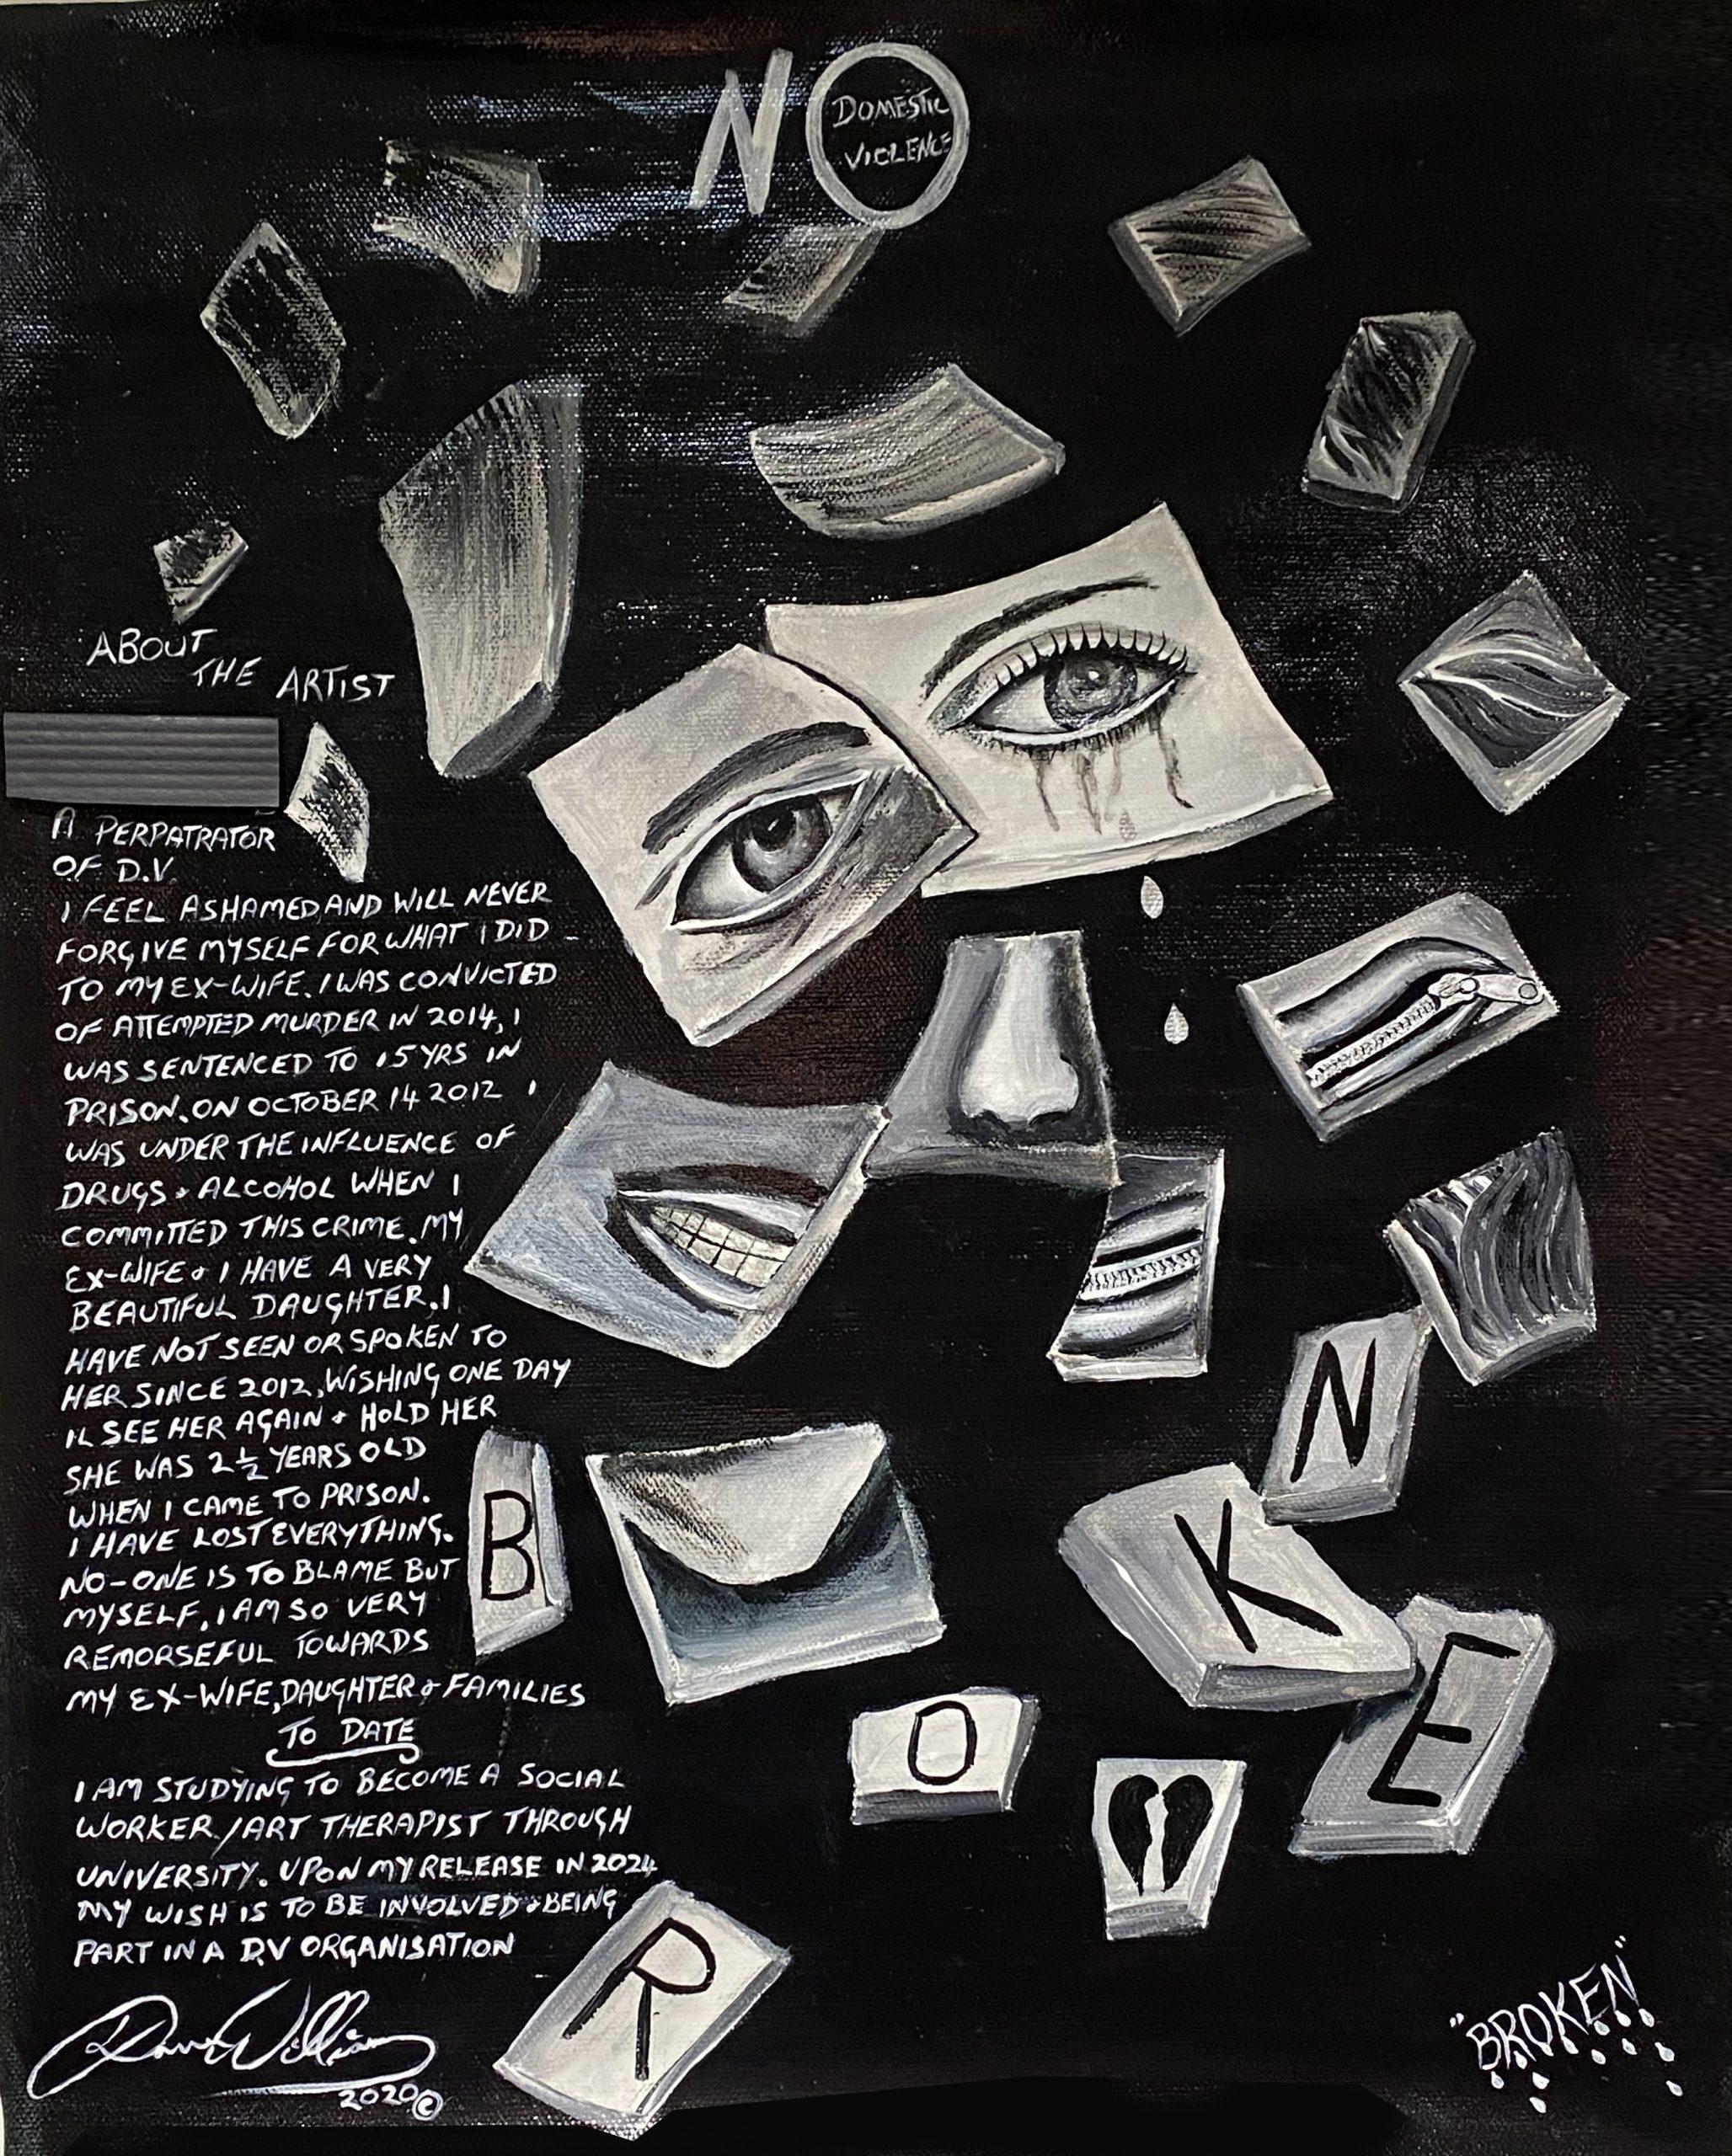 Domestic Violence - Artwork